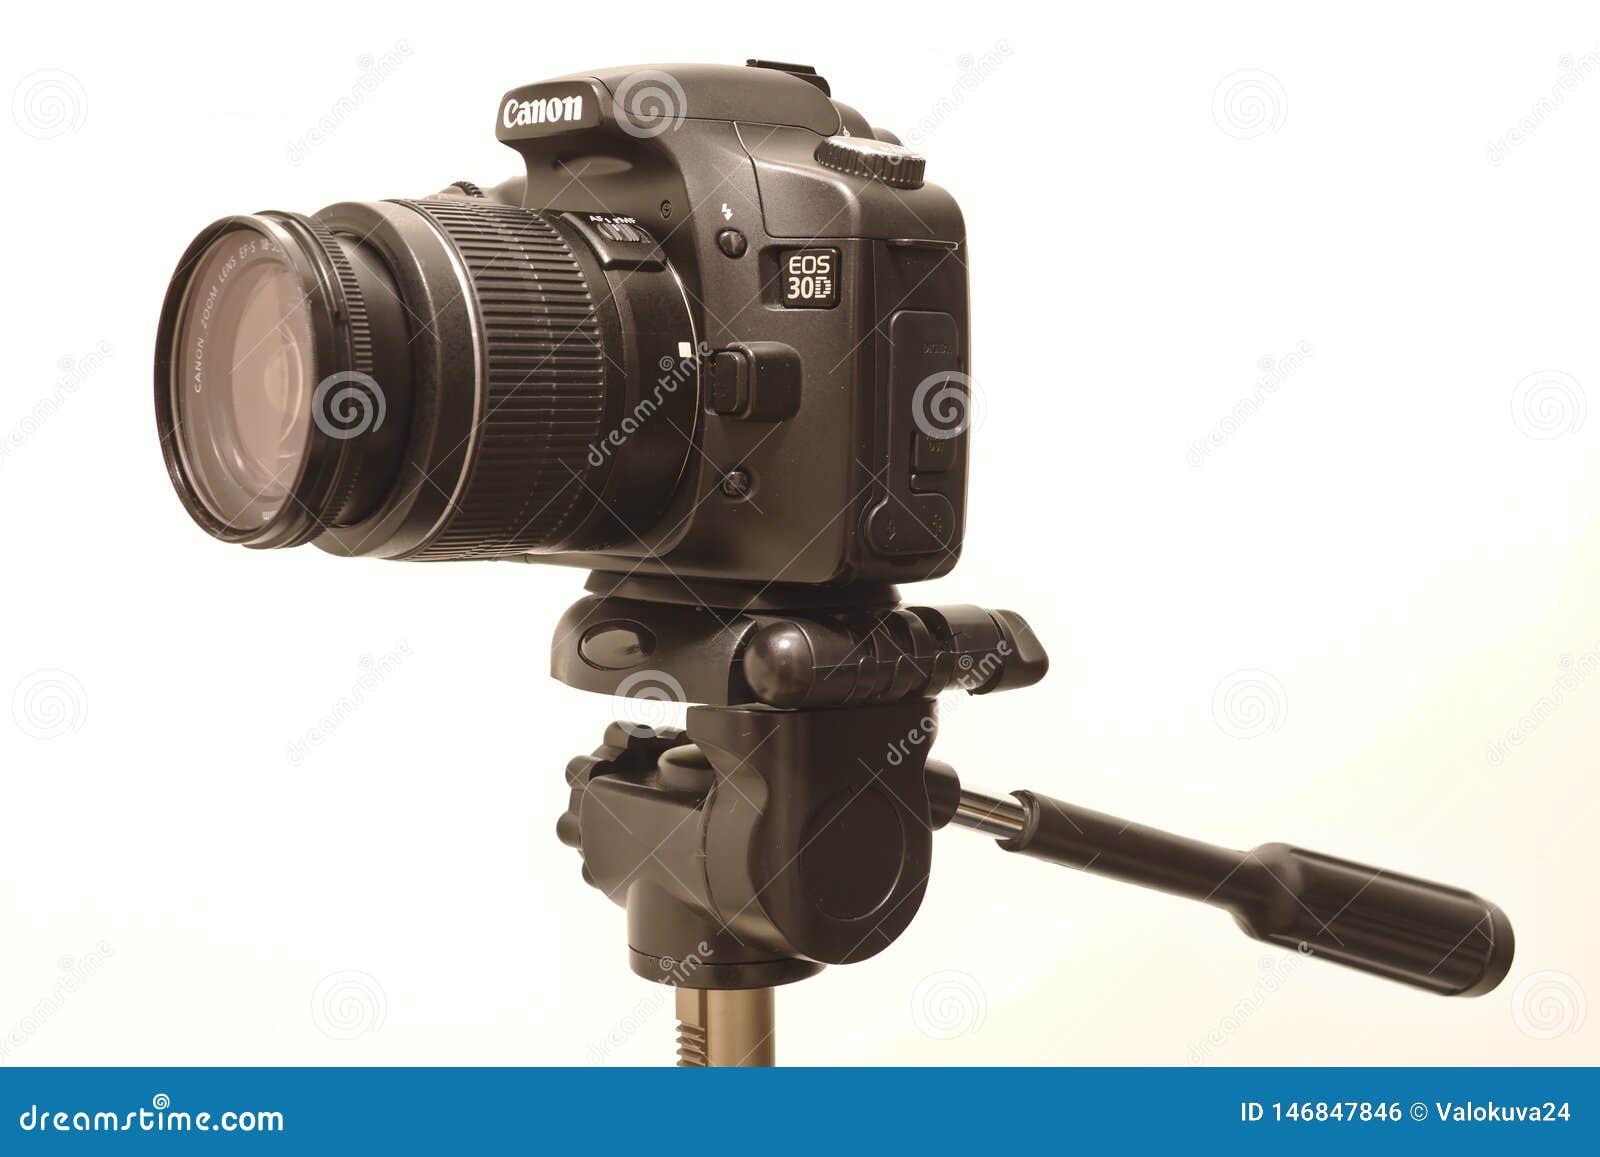 Canon Eos 30d Camera Editorial Photo Image Of Photoshoot 146847846